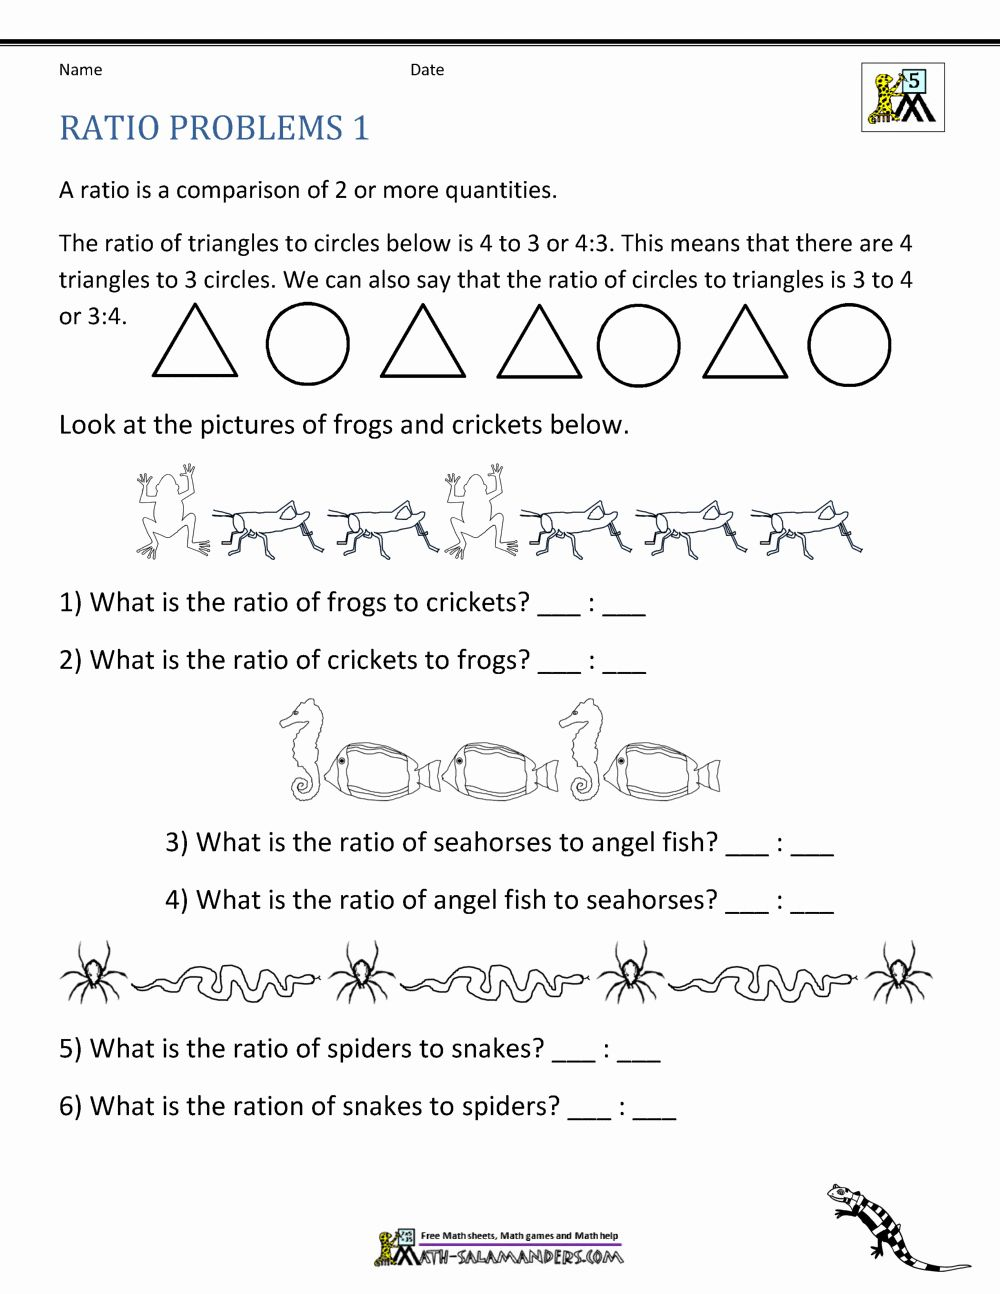 Worksheet Math Grade 5 In 2020 Free Math Worksheets Word Problem Worksheets Ratio And Proportion Worksheet